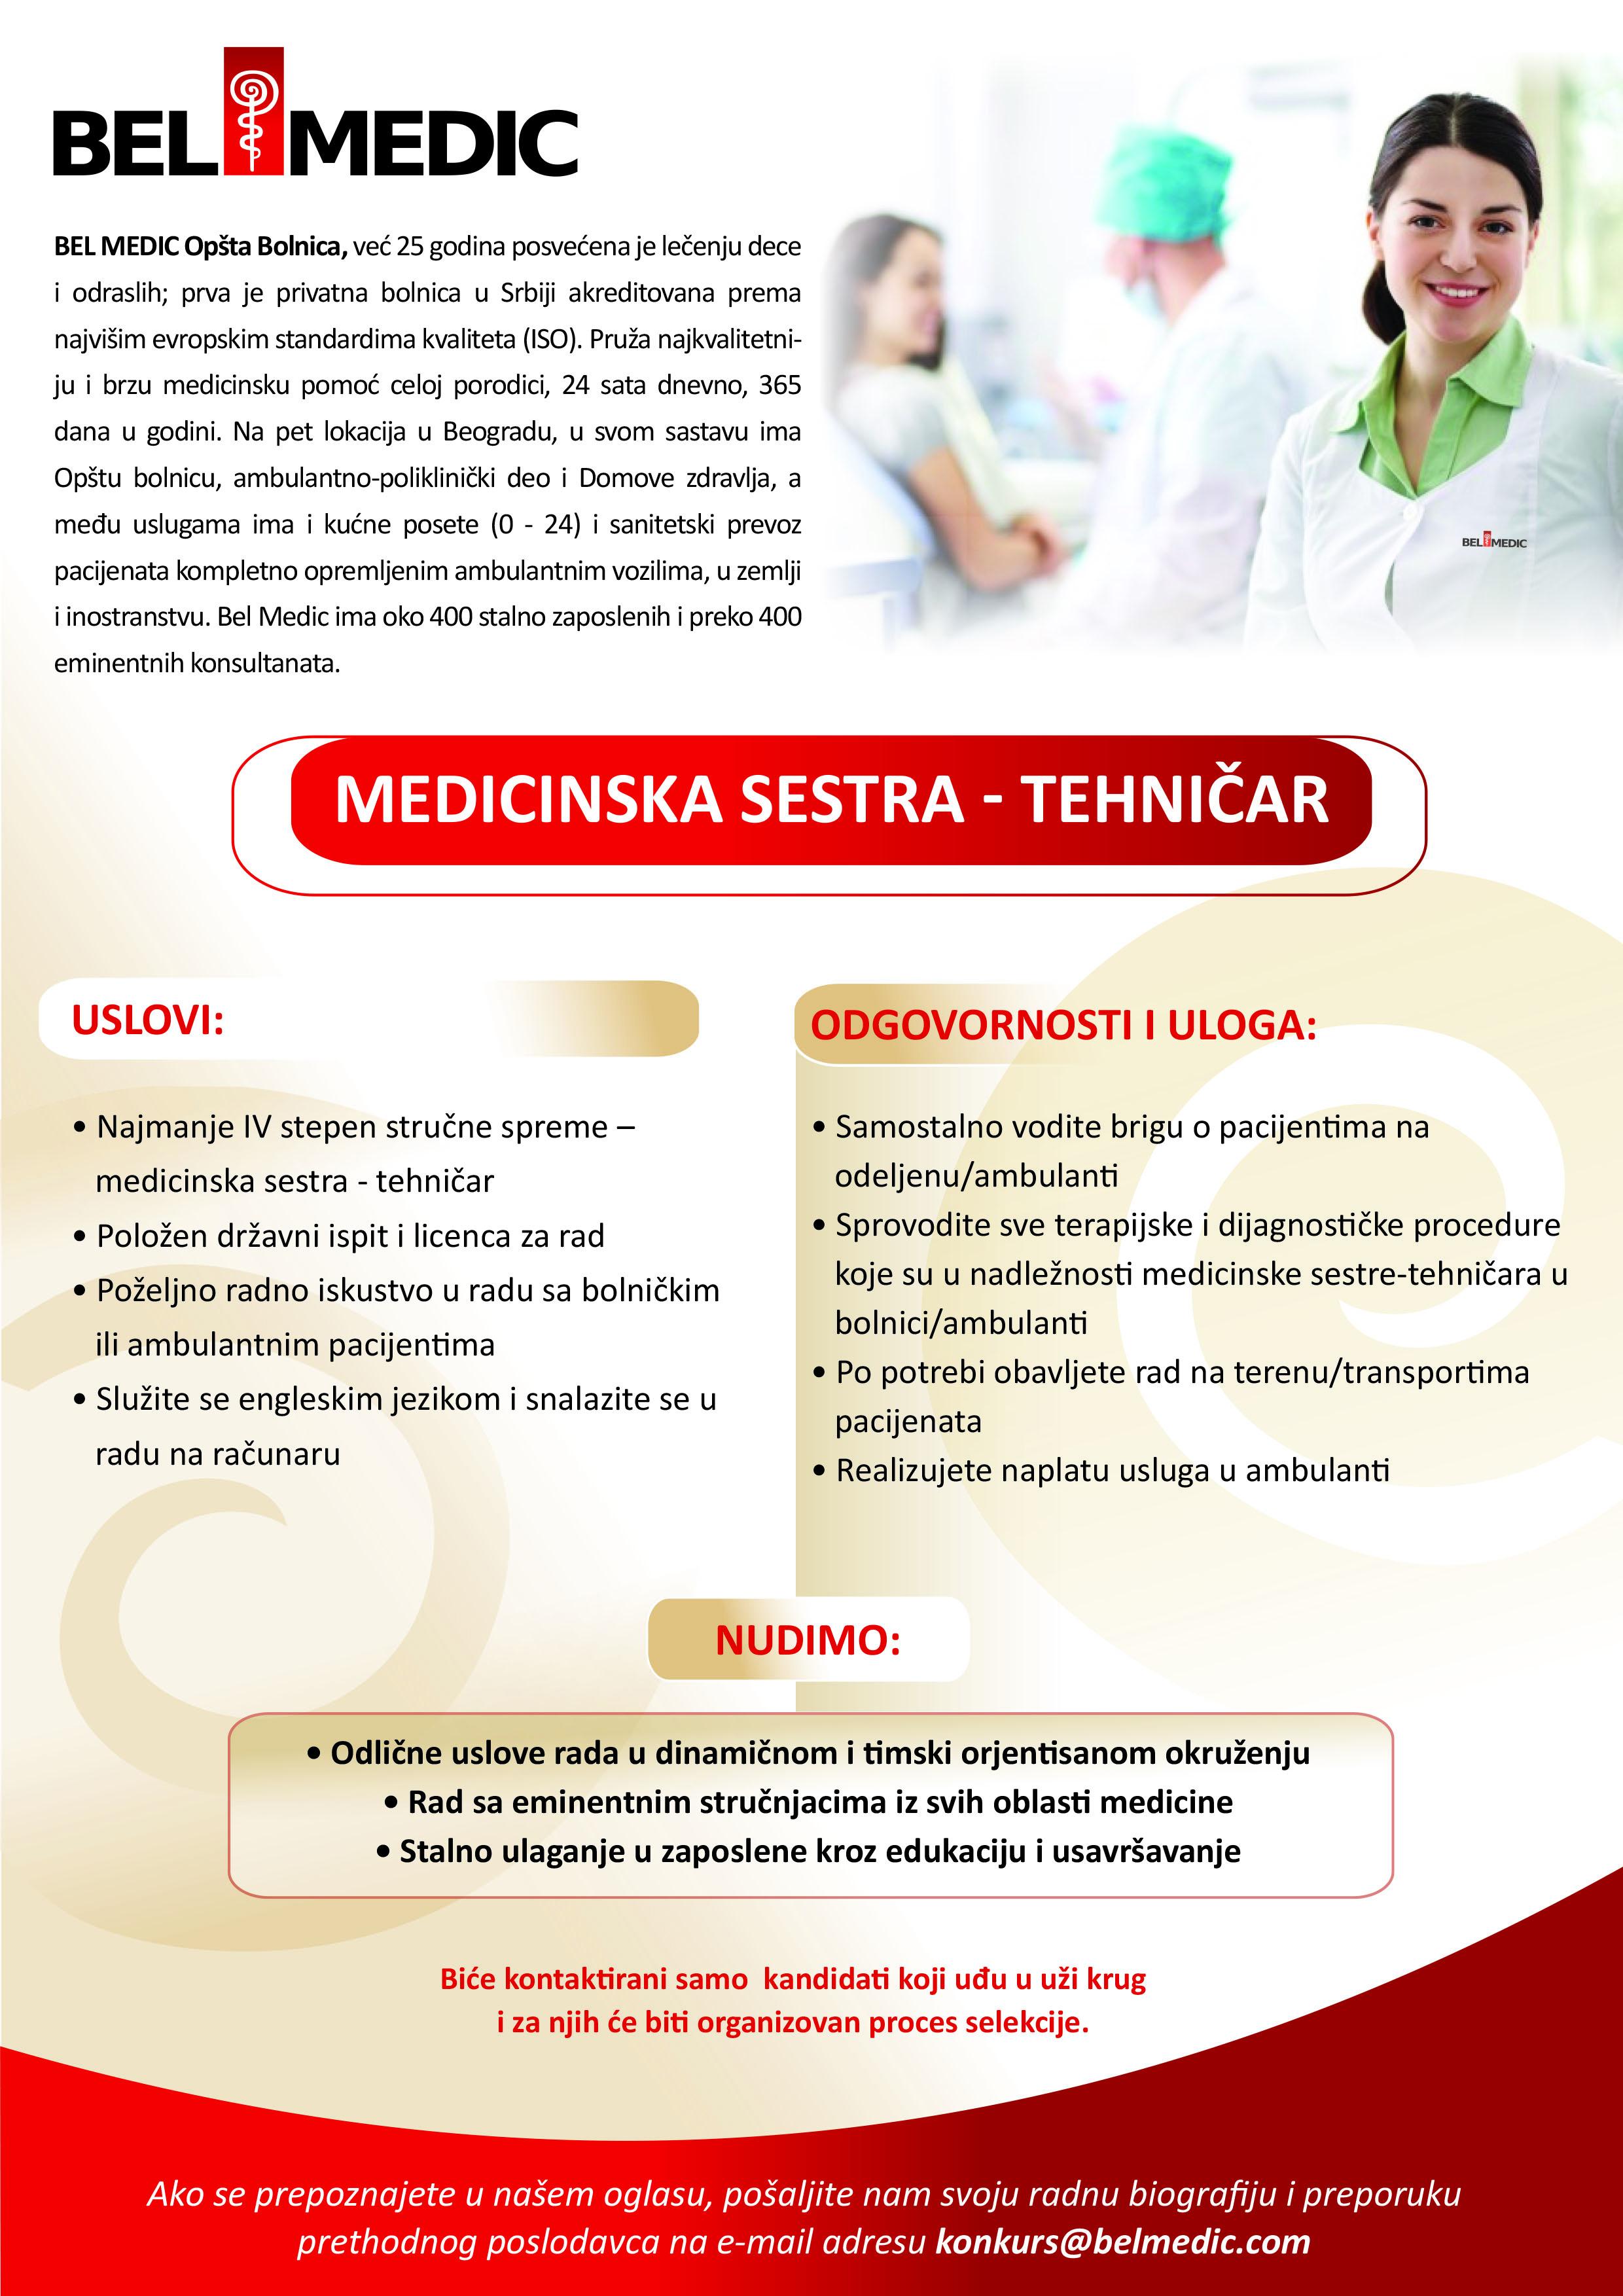 Medicinska sestra - tehničar oglas za posao u Bel Medic-u